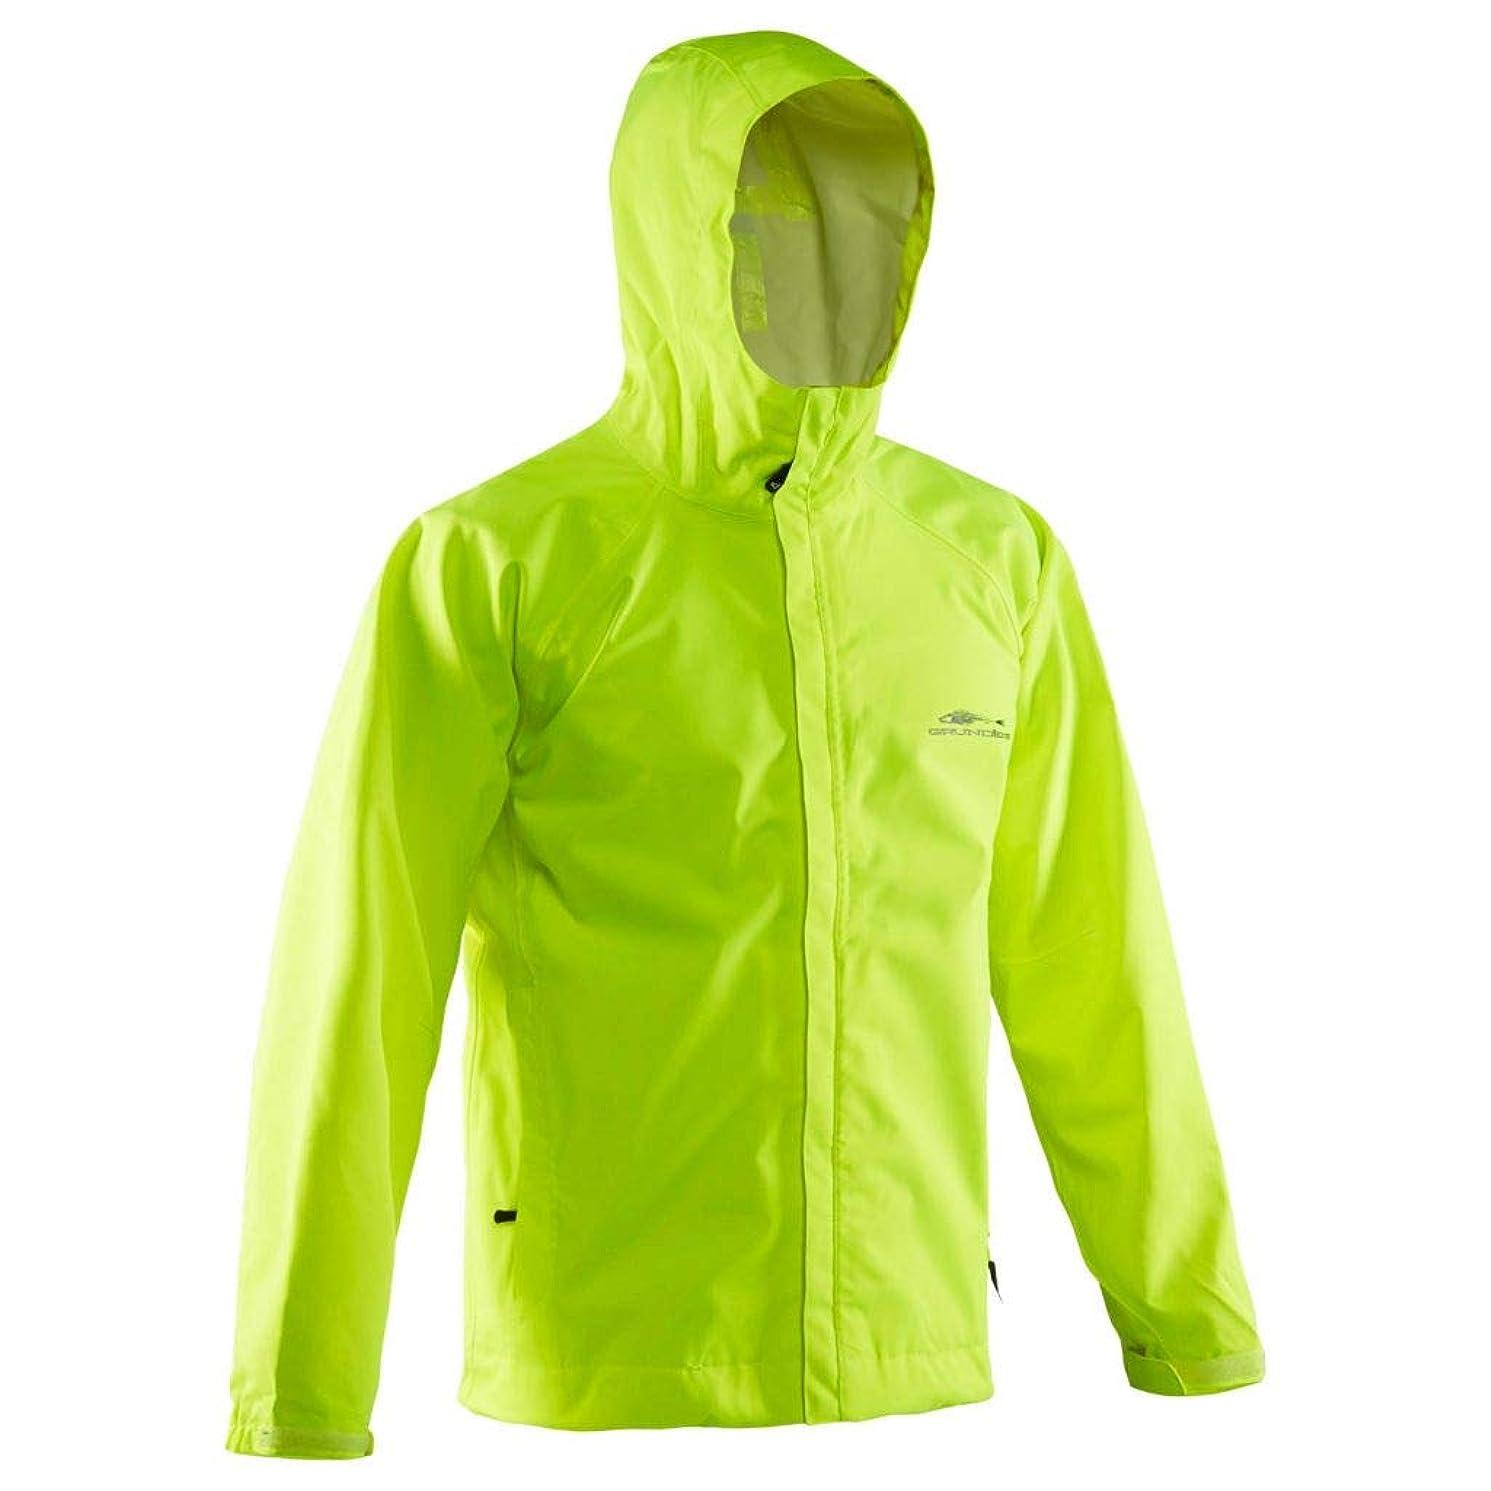 Grundéns Weather Watch Hooded Fishing Jacket